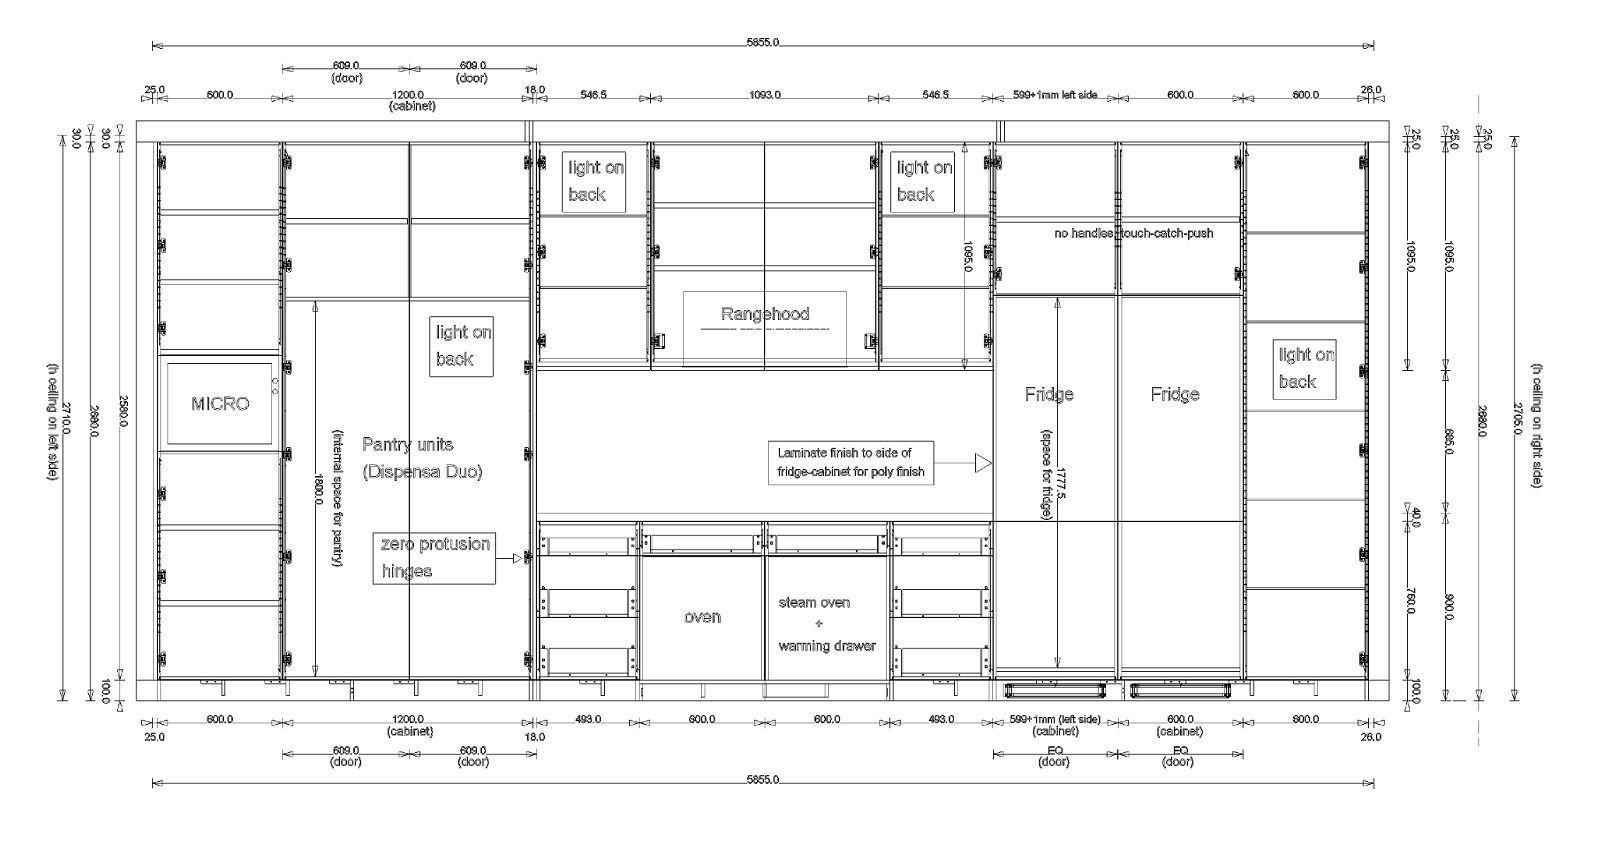 Furniture Design Software Spazio3d Professional Brainsoftware Spazio3d Cad For Concrete Structures